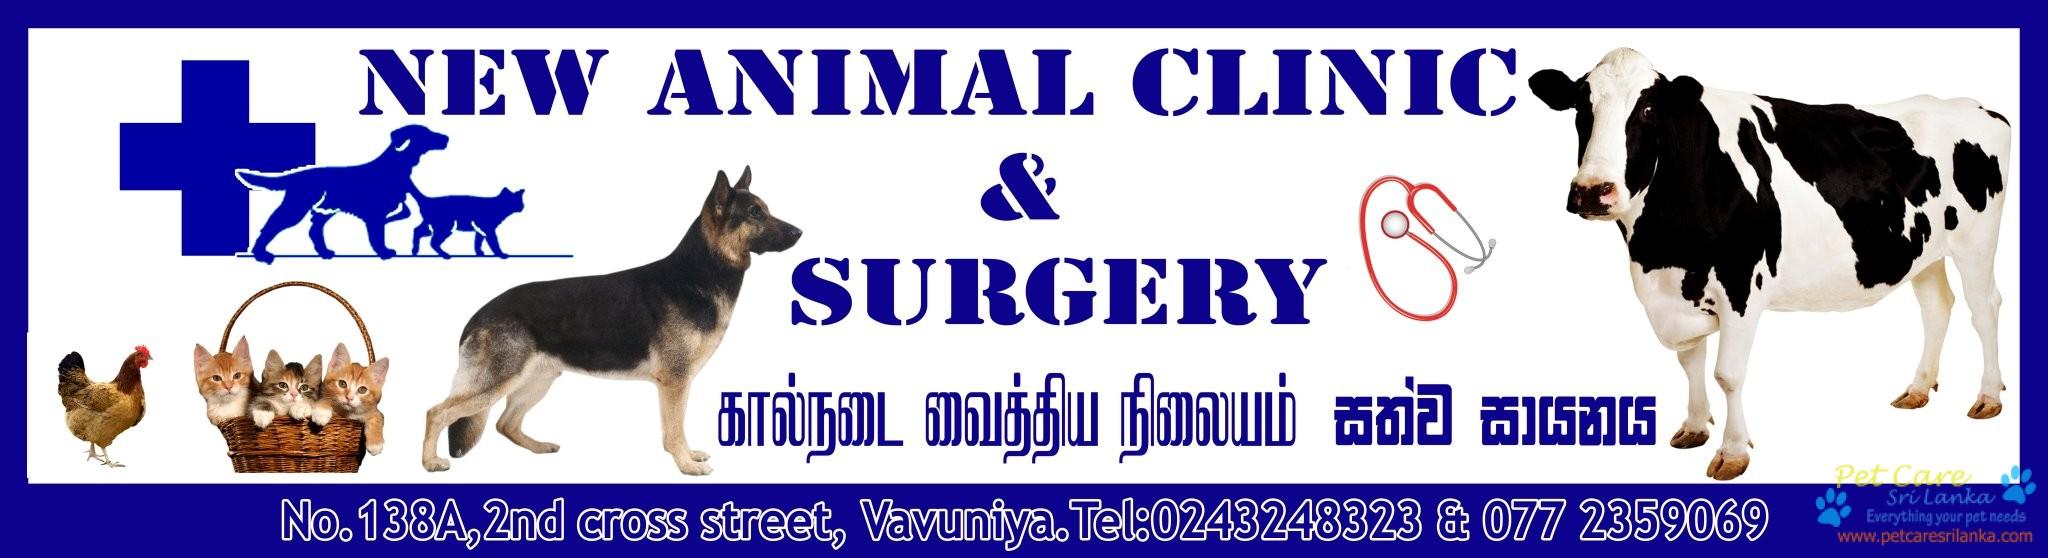 New Animal clinic and Surgery Veterinary Hospital4.jpg